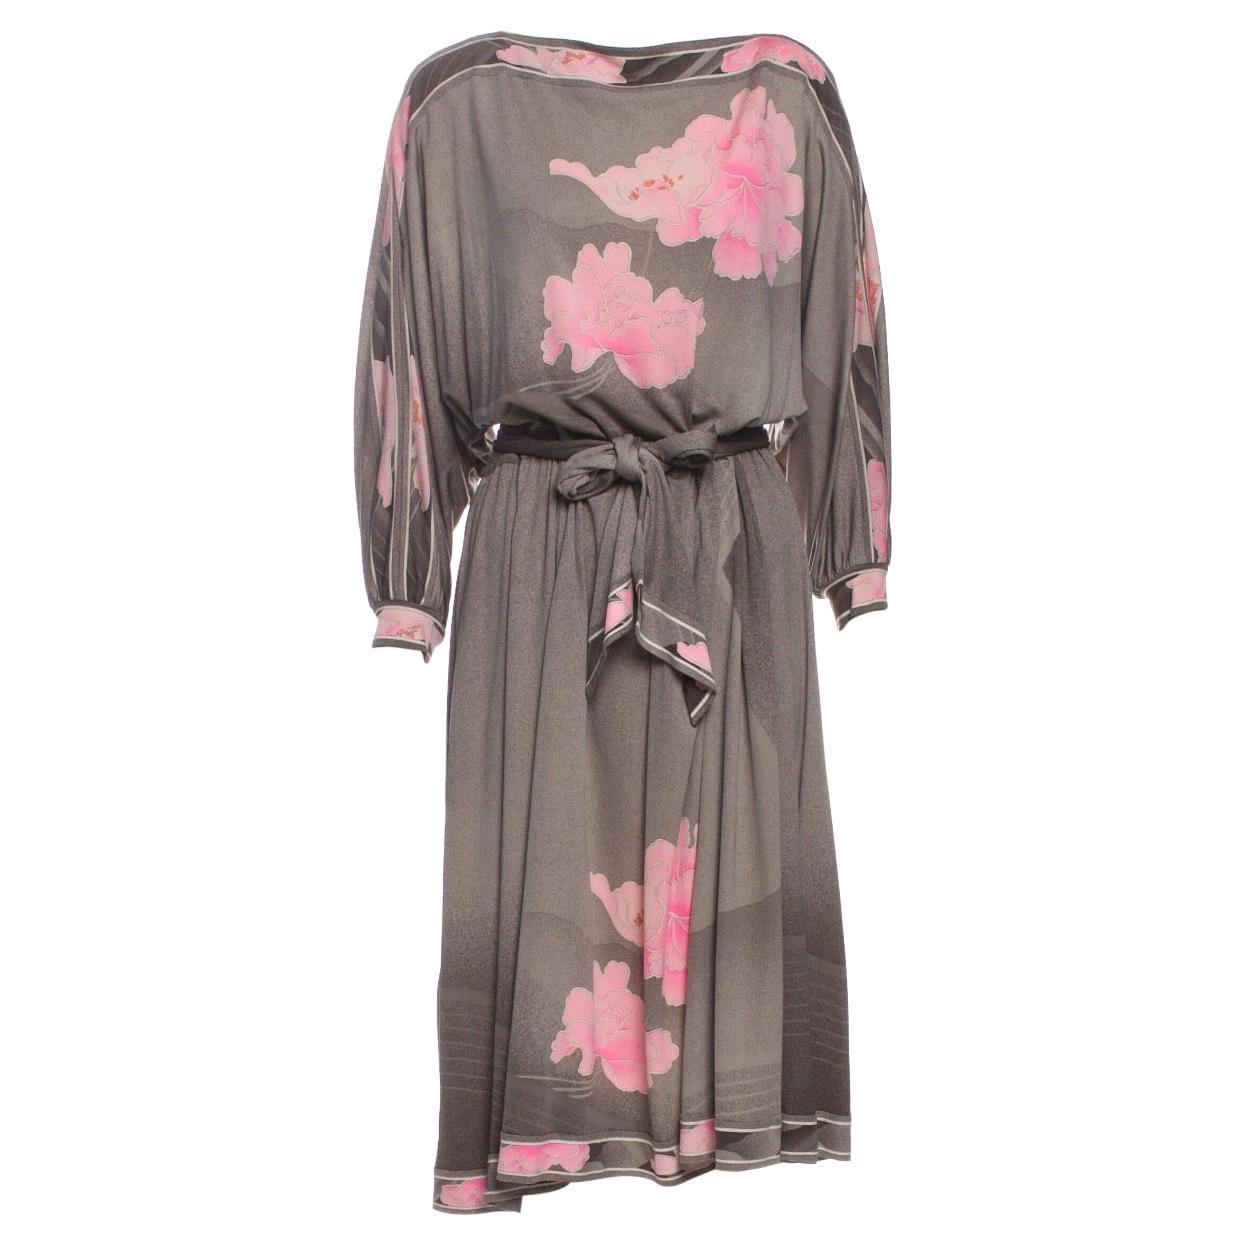 Leonard Paris 1970s Floral Print Silk Jersey Dress